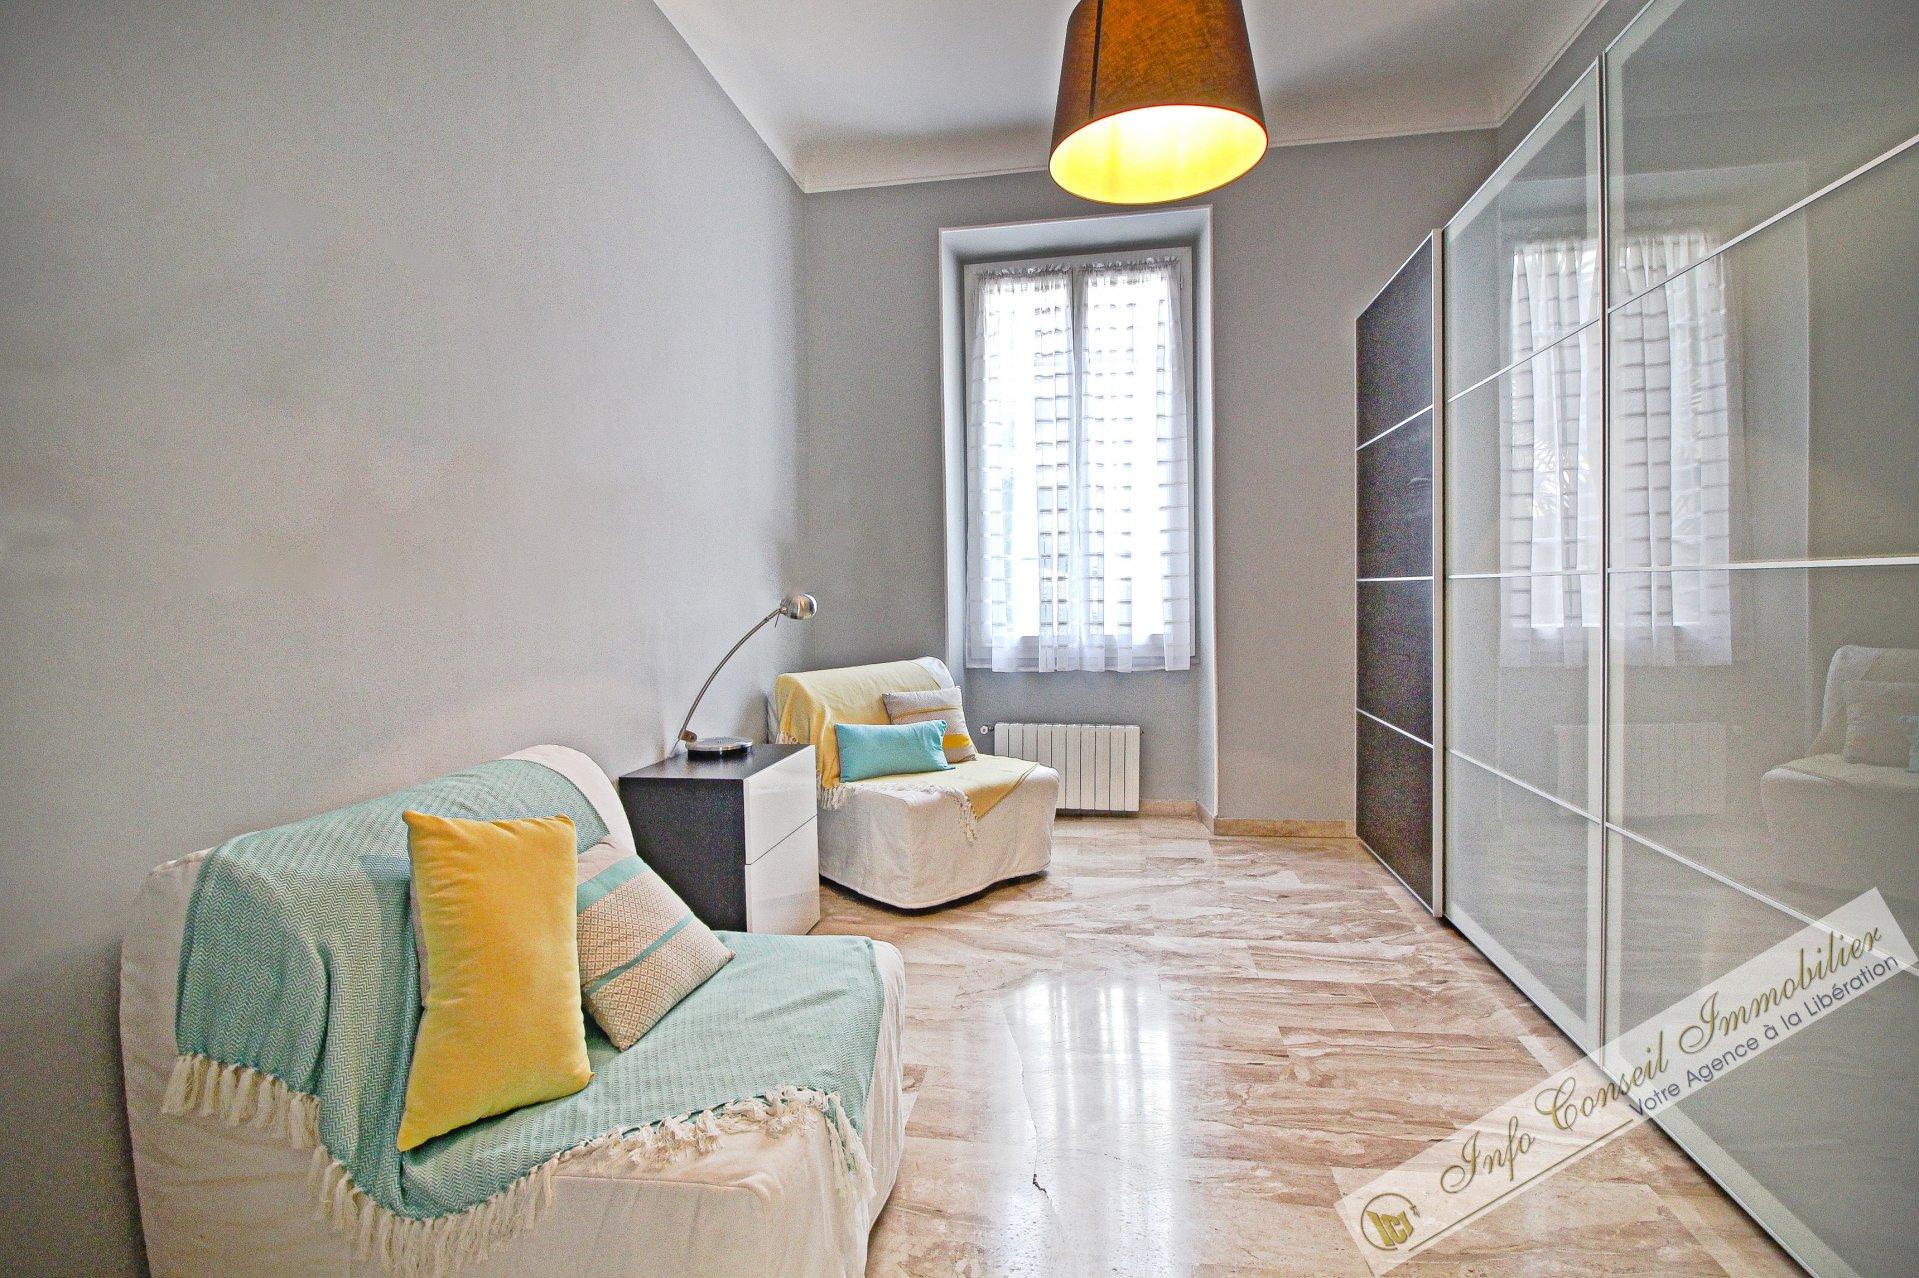 LIBERATION - Bel Immeuble - 3/4P - 95 m² - TBE - 365.000 €